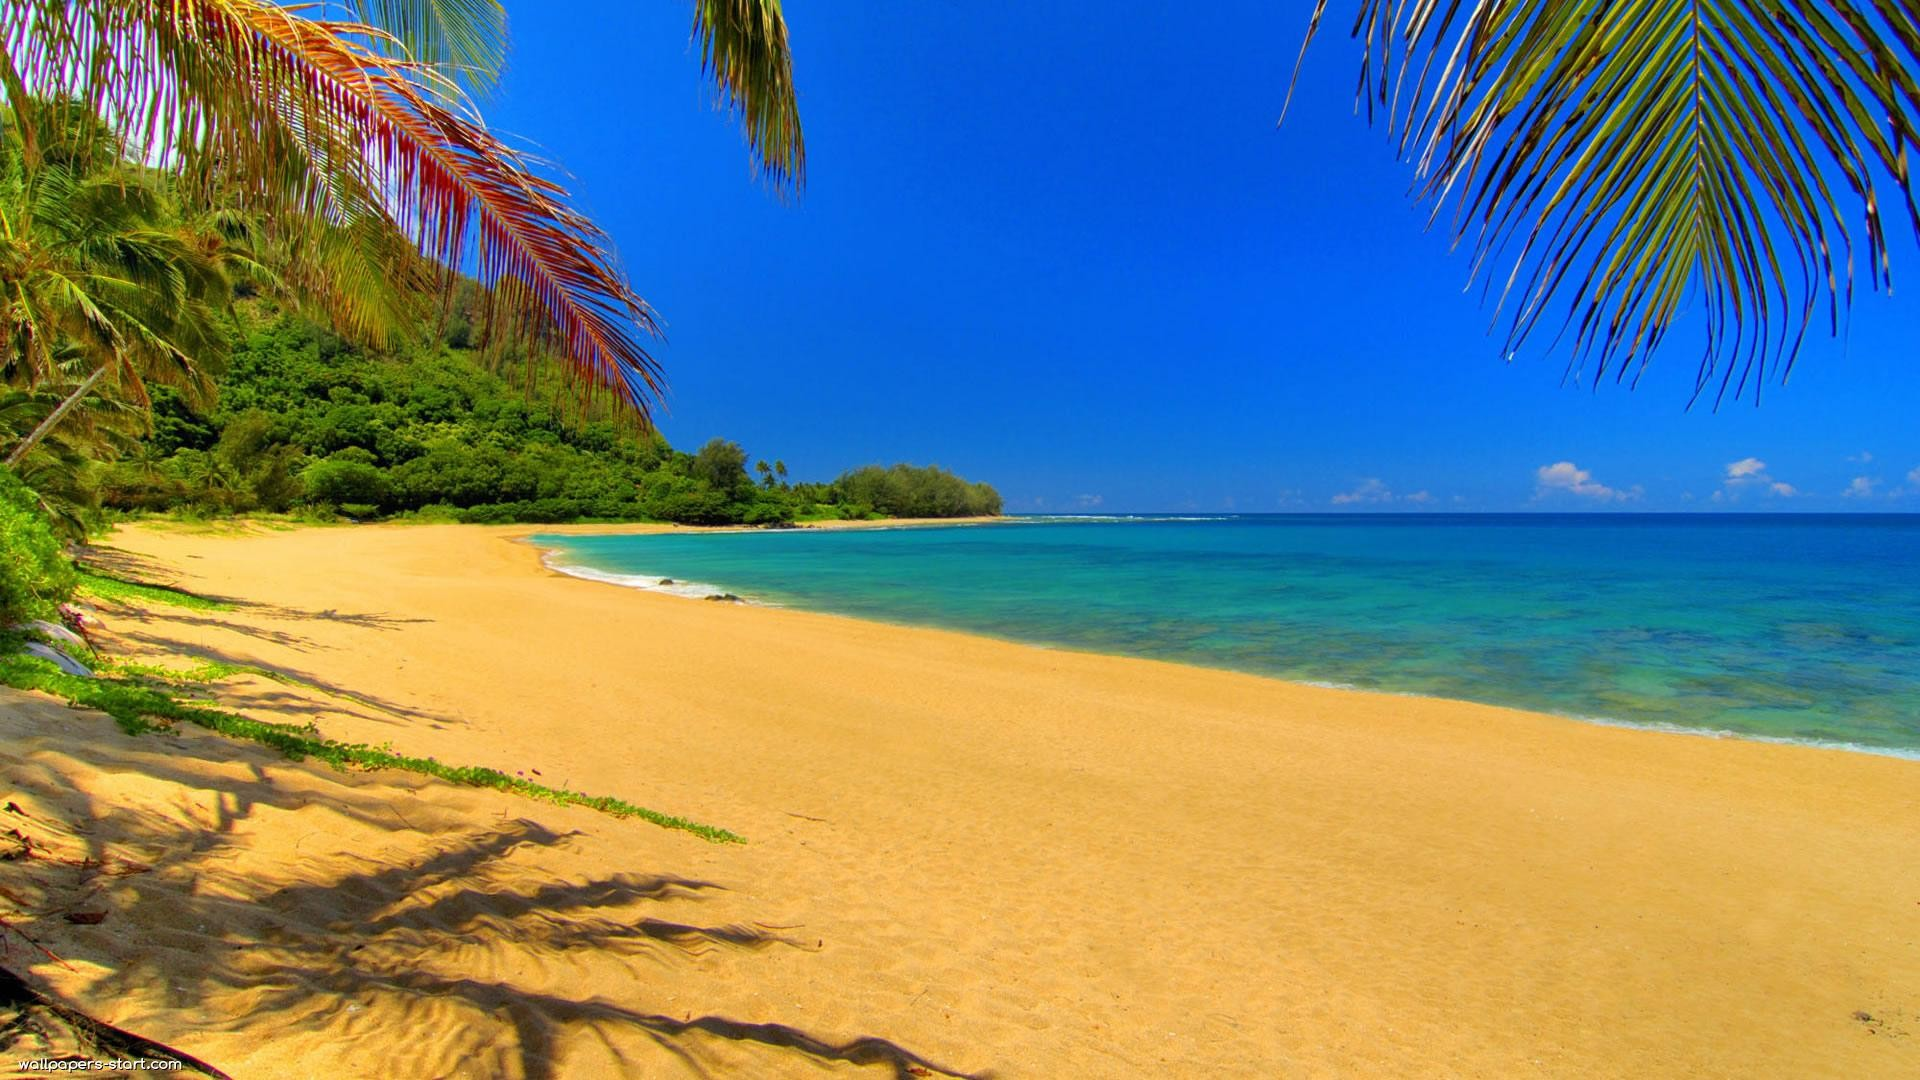 Beach summer backgrounds desktop free download.